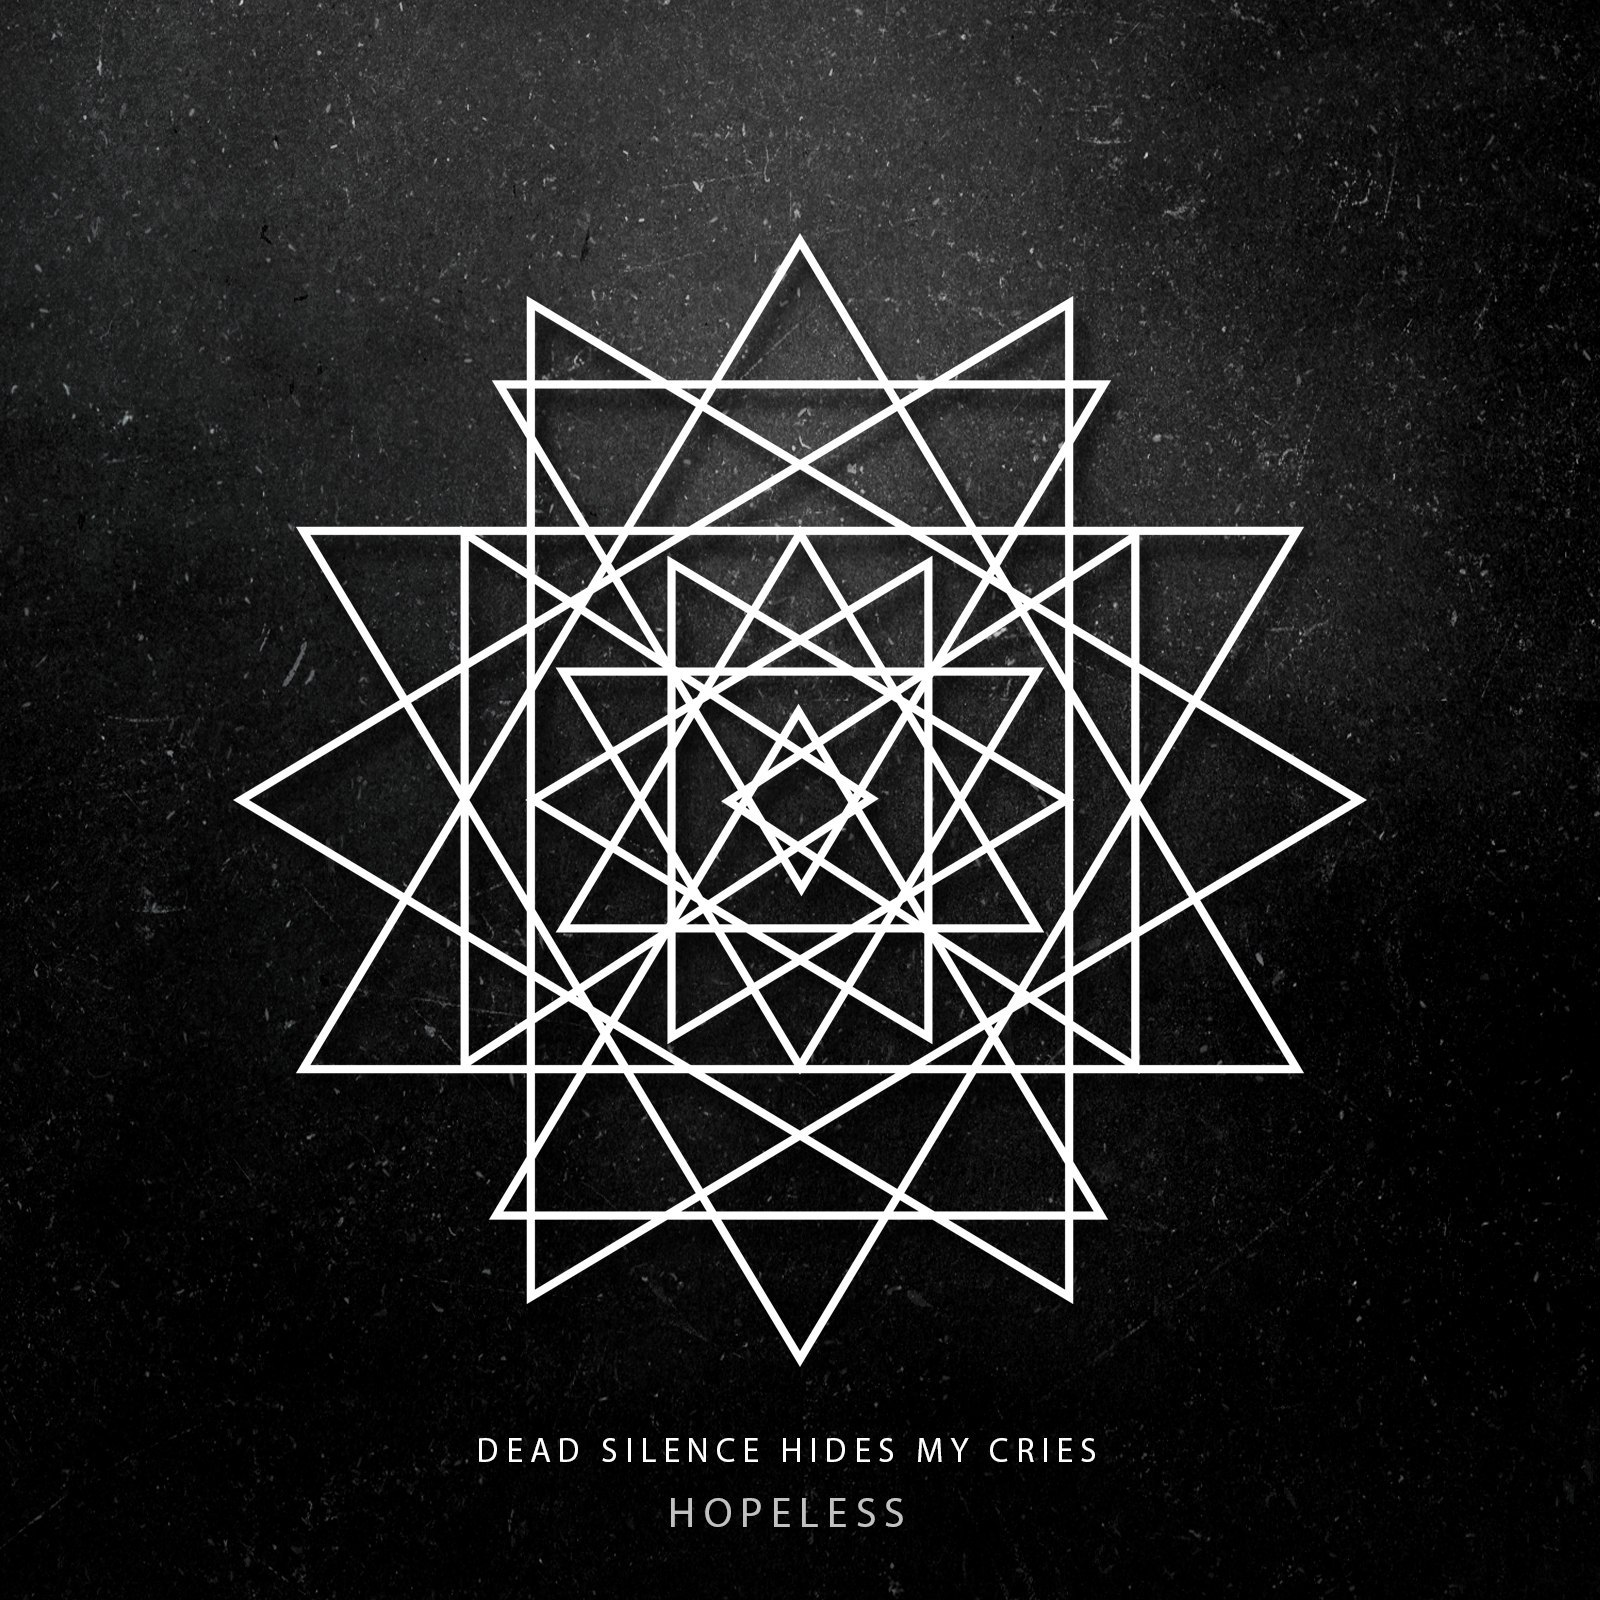 Dead Silence Hides My Cries - Hopeless [single] (2016)